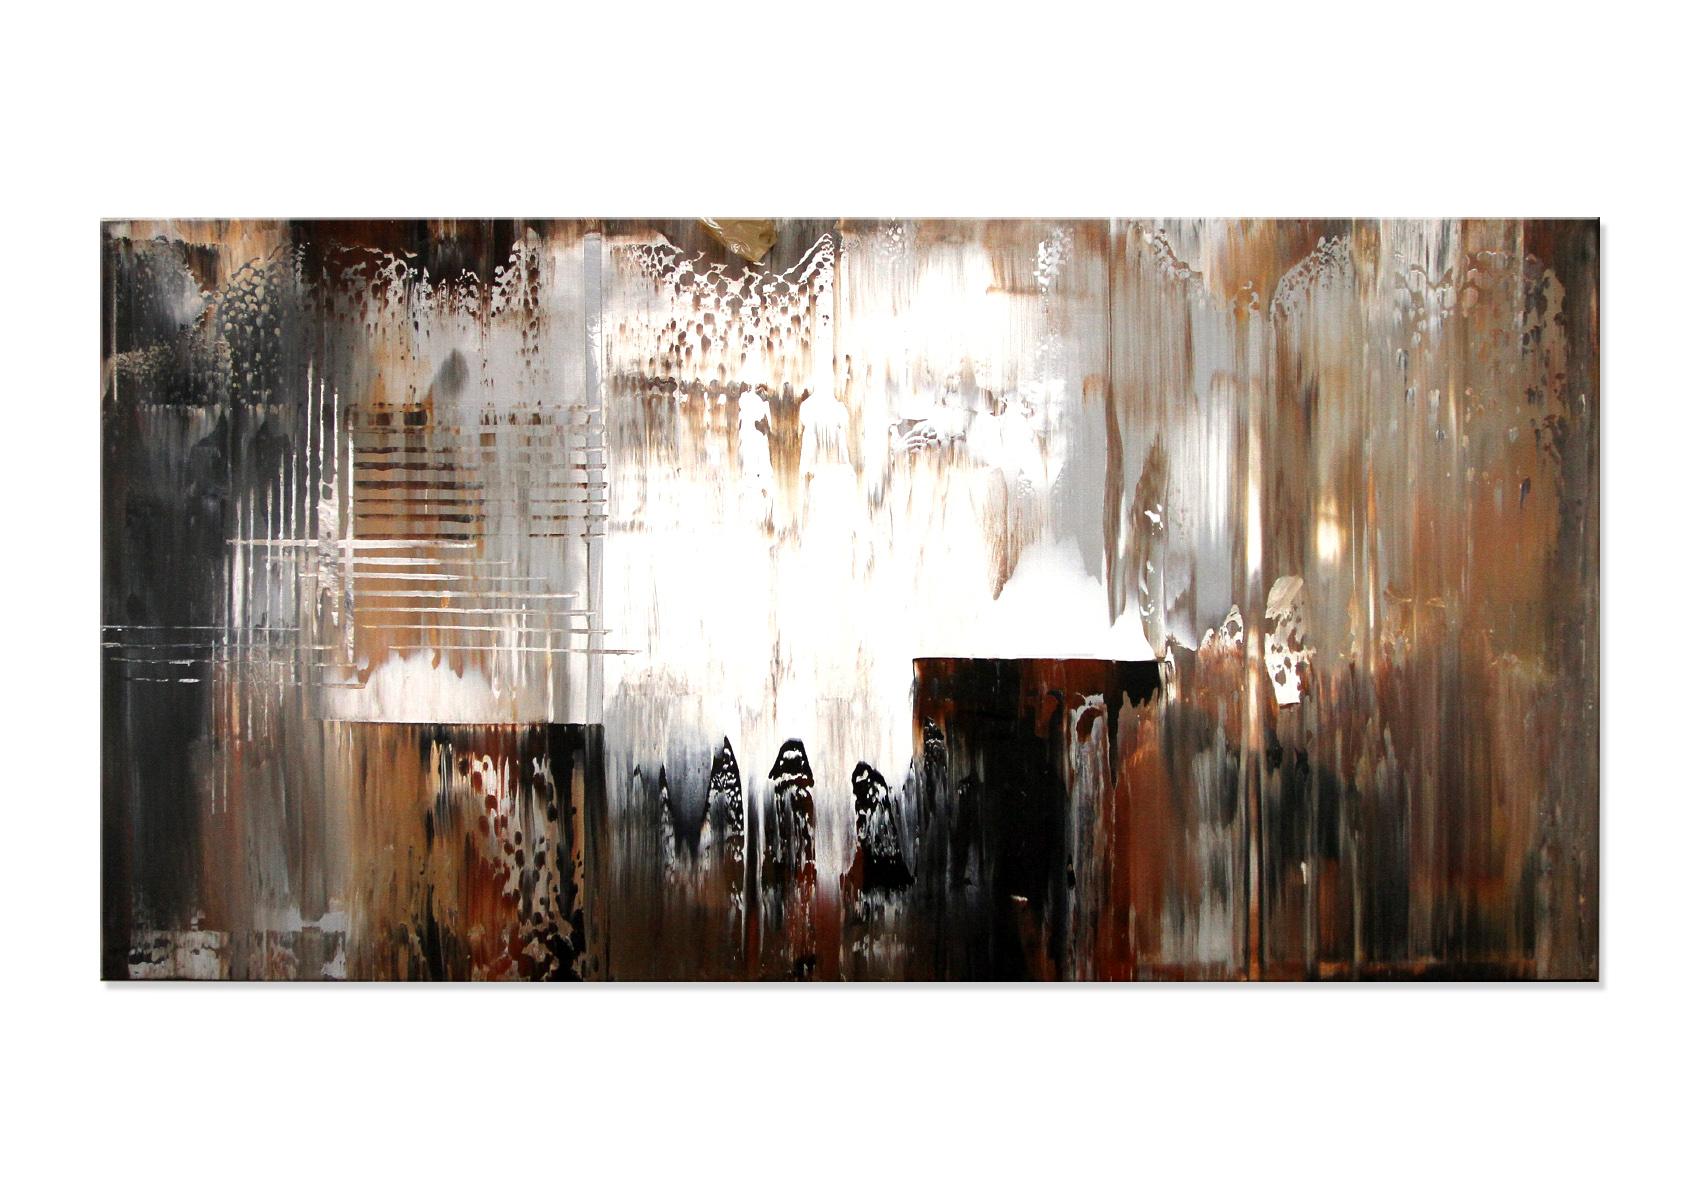 acrylgem lde kaufen abstrakte moderne bilder galerie atelier dieu cross my mind galerie. Black Bedroom Furniture Sets. Home Design Ideas